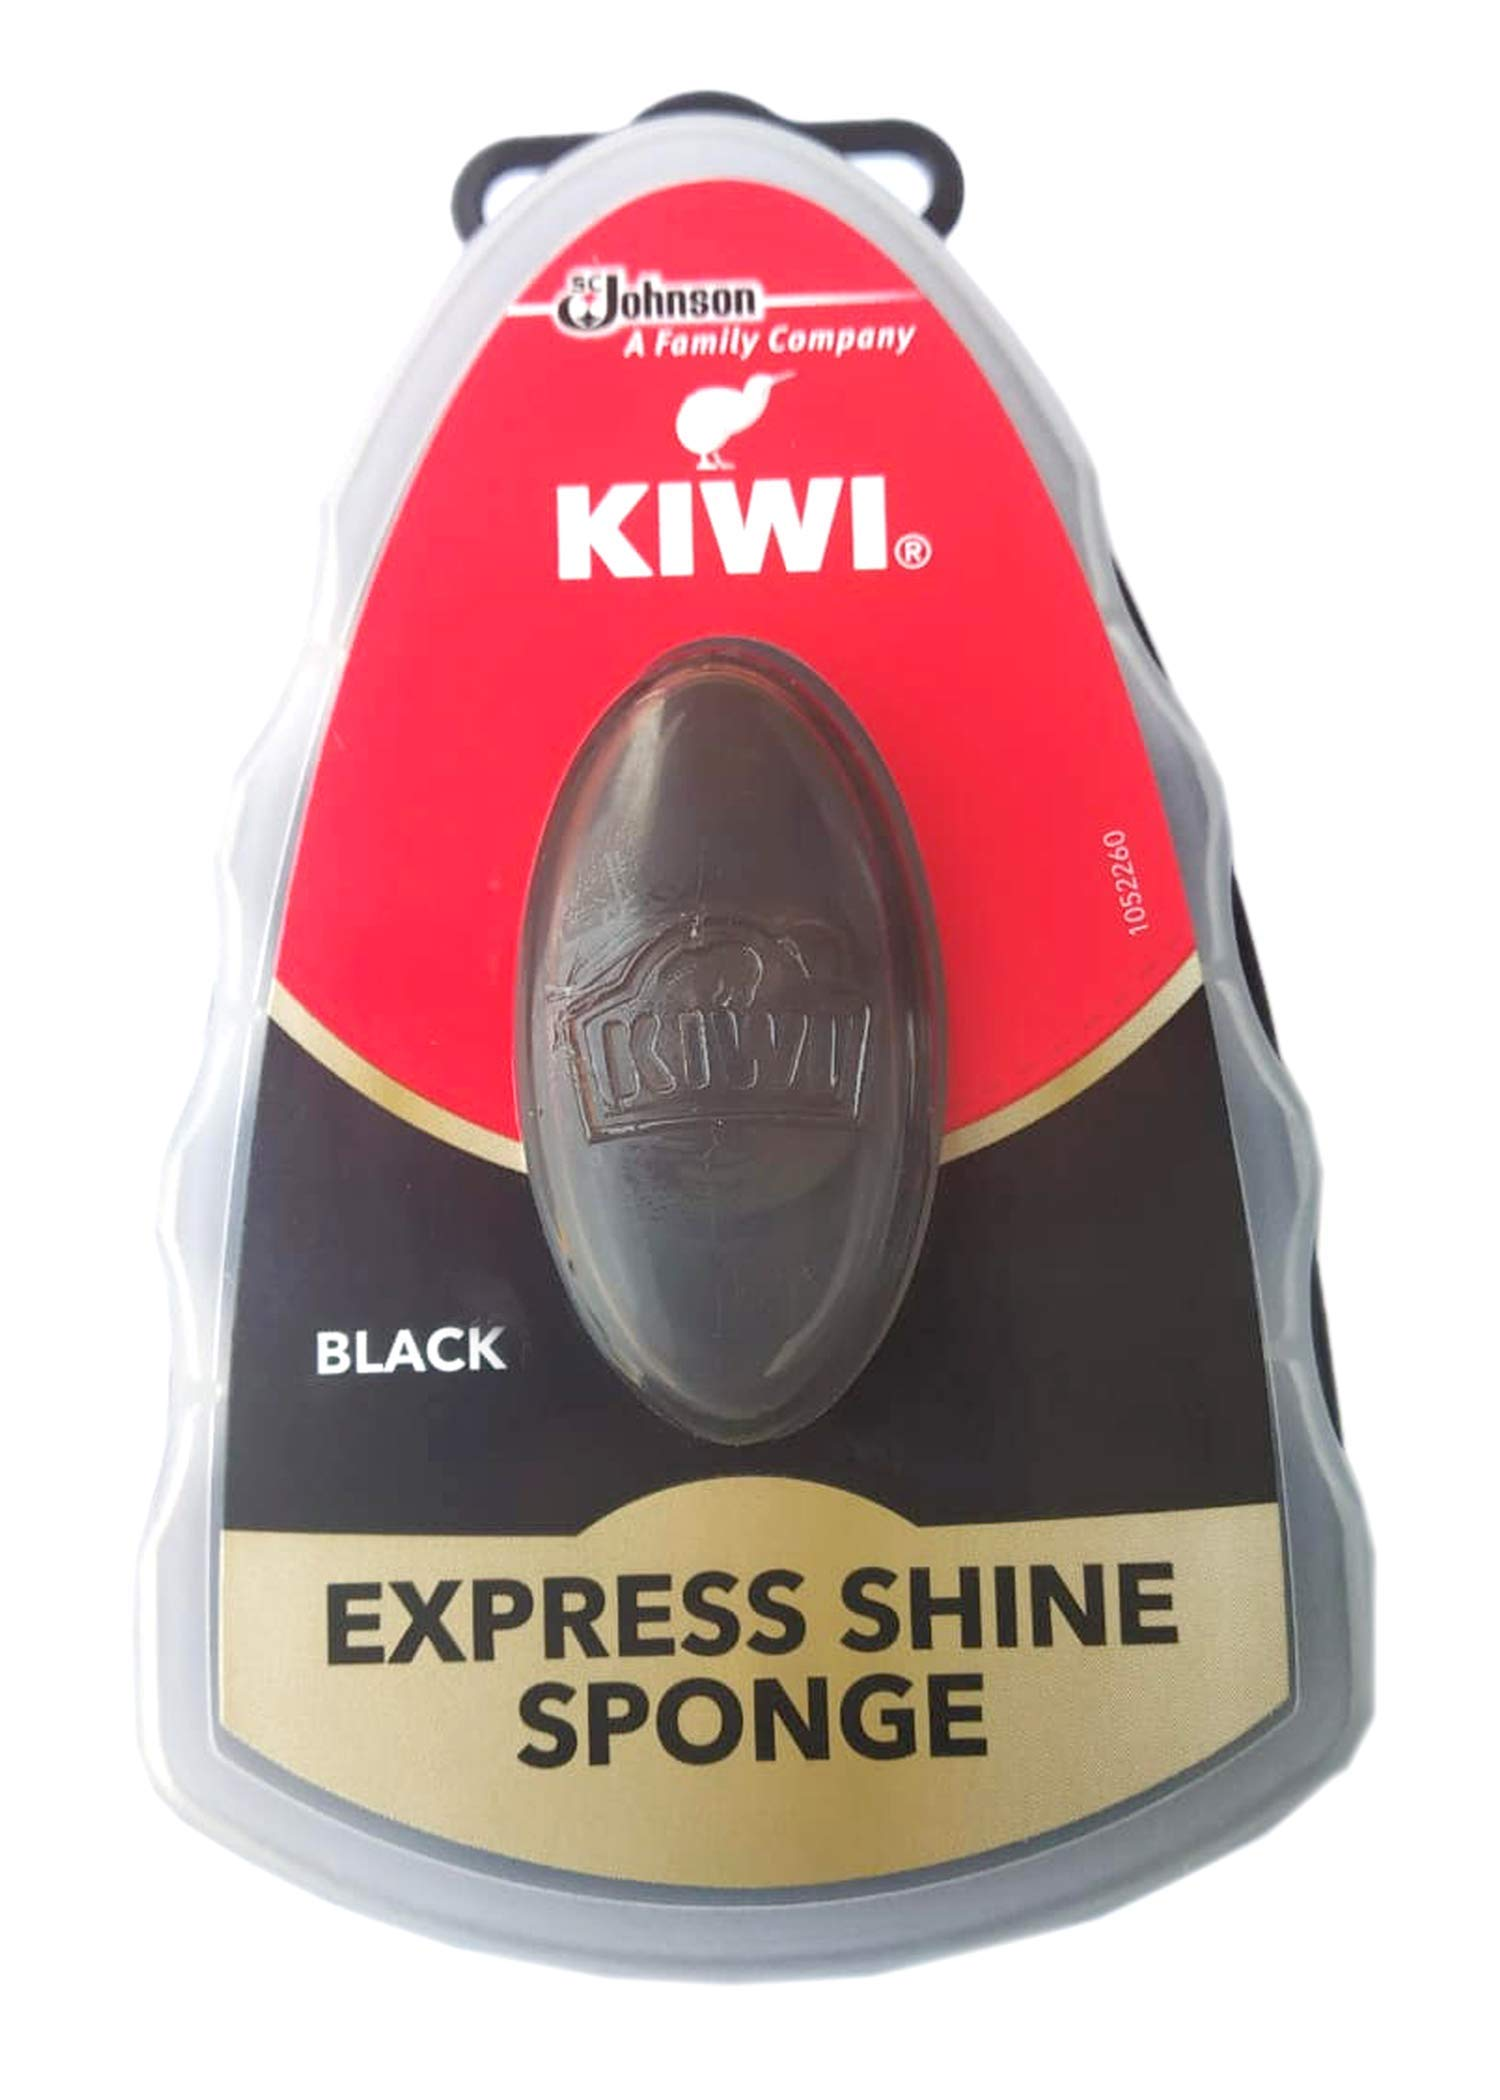 Kiwi Express Shoe Shine Sponge, Black 0.2 fl oz